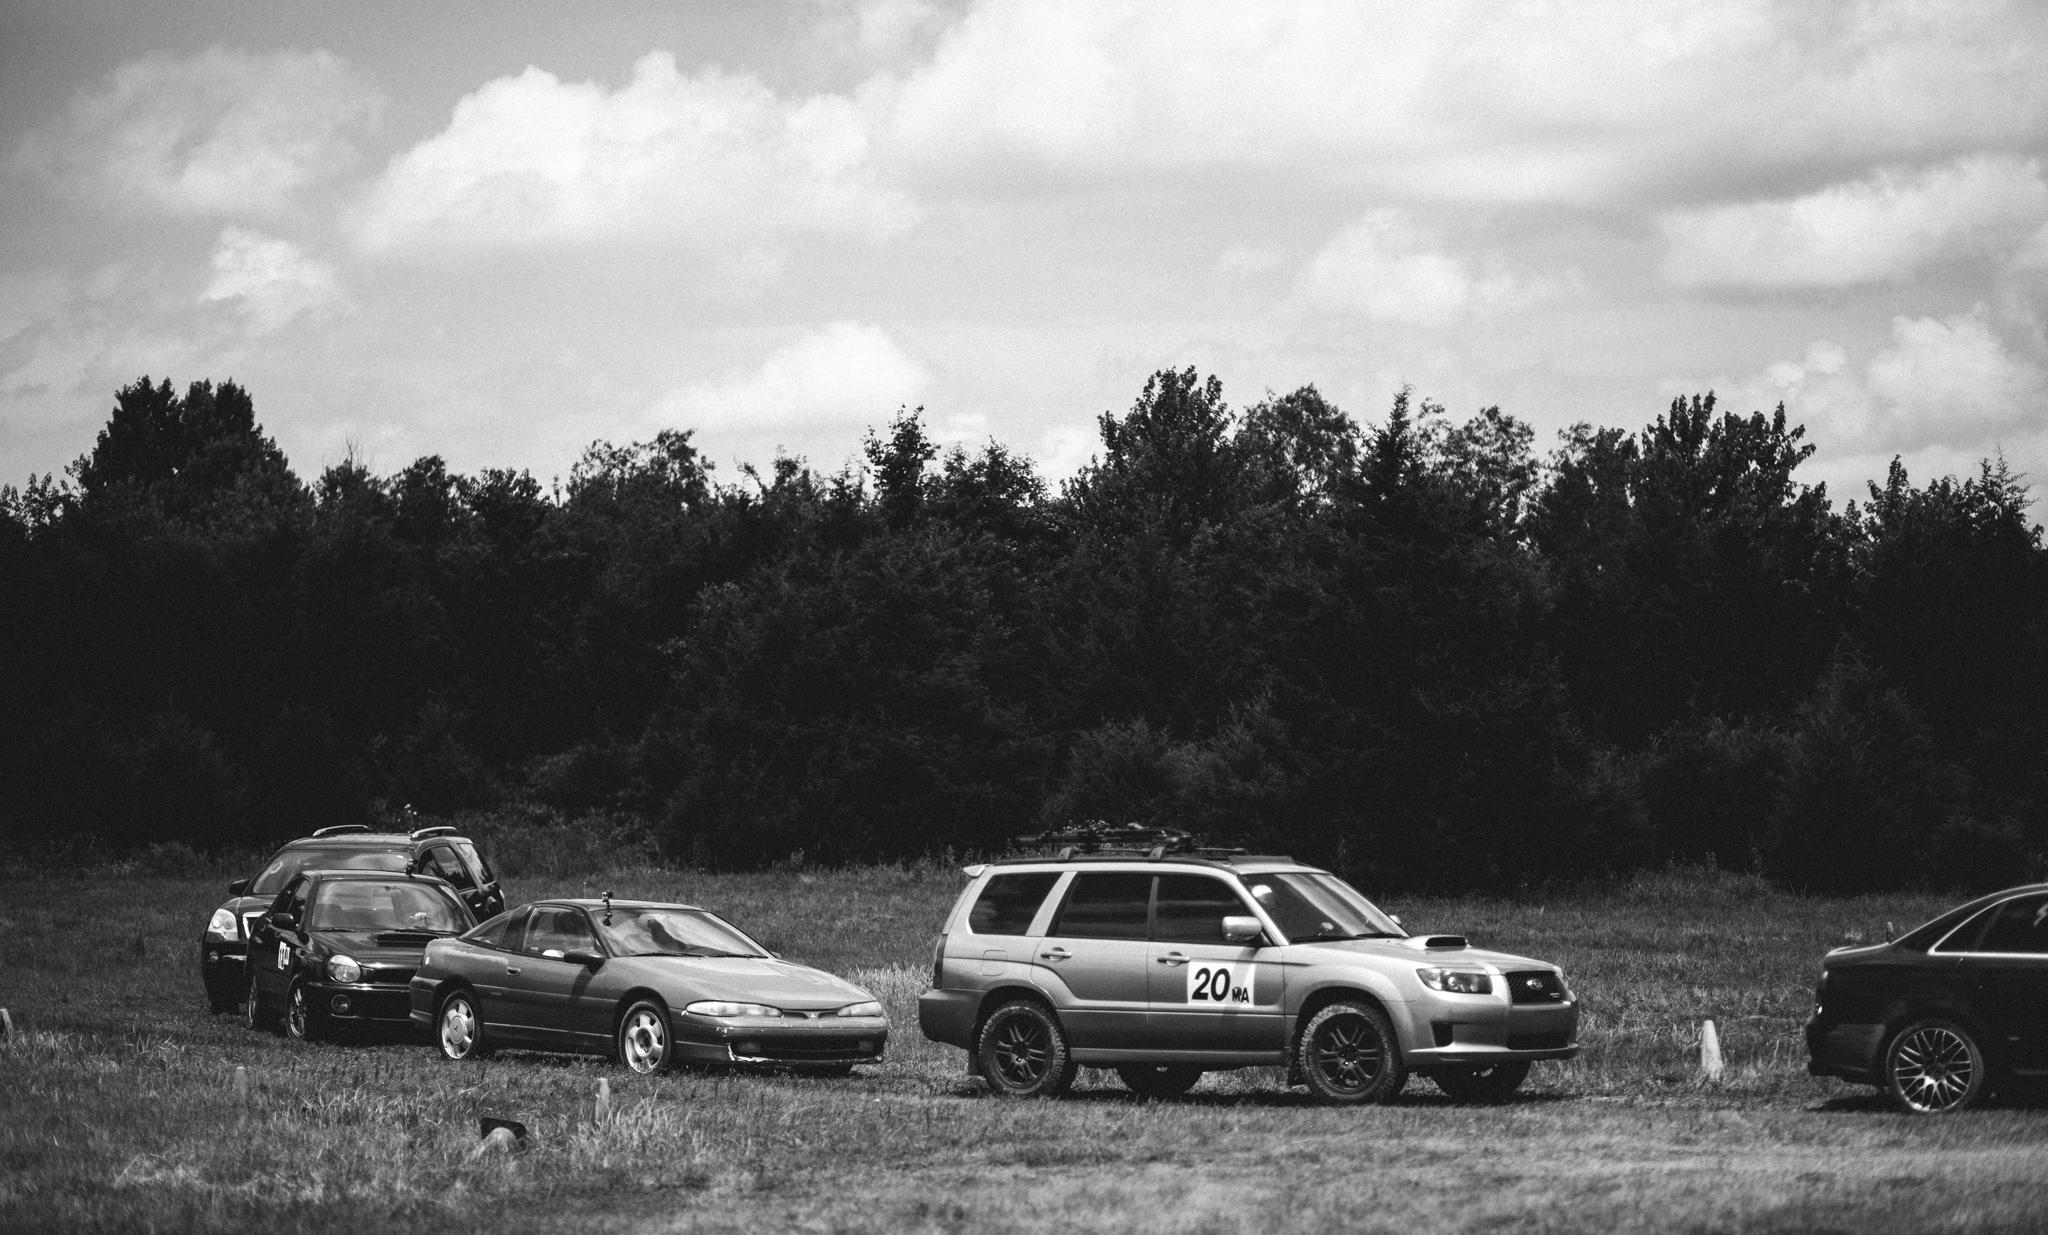 rallycrossjune2015_002.jpg